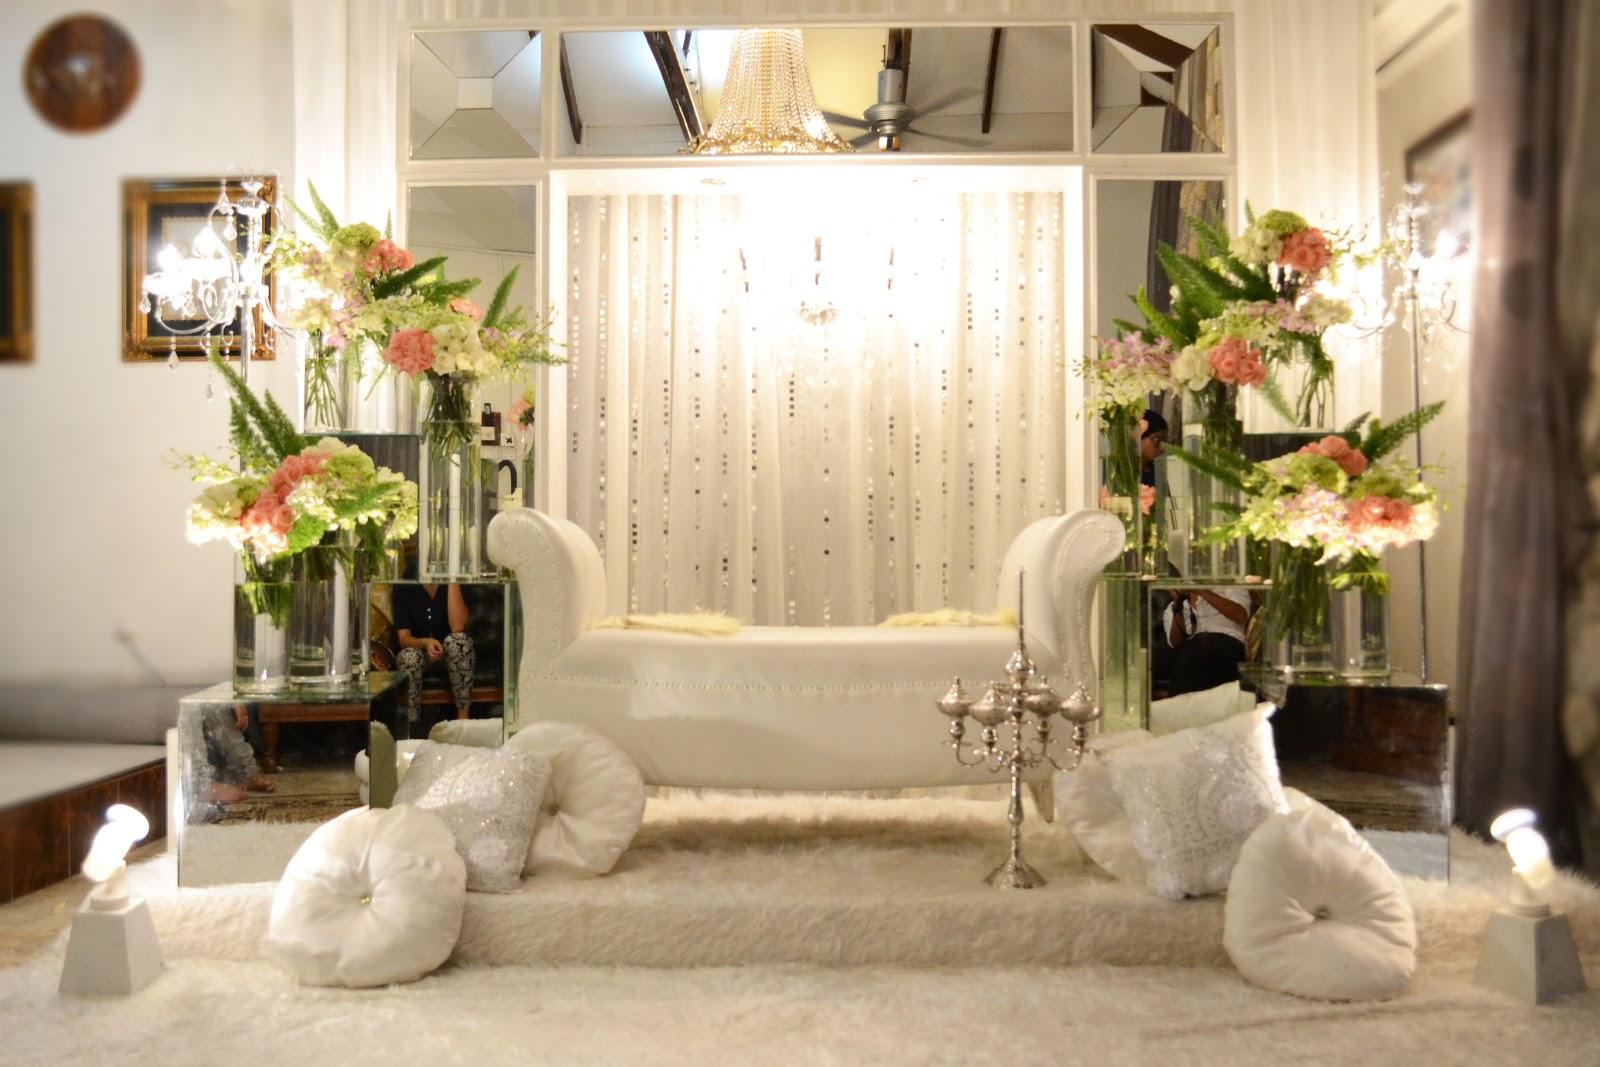 Pelamin sanding hanim fl adore wedding design for Sillones antiguos